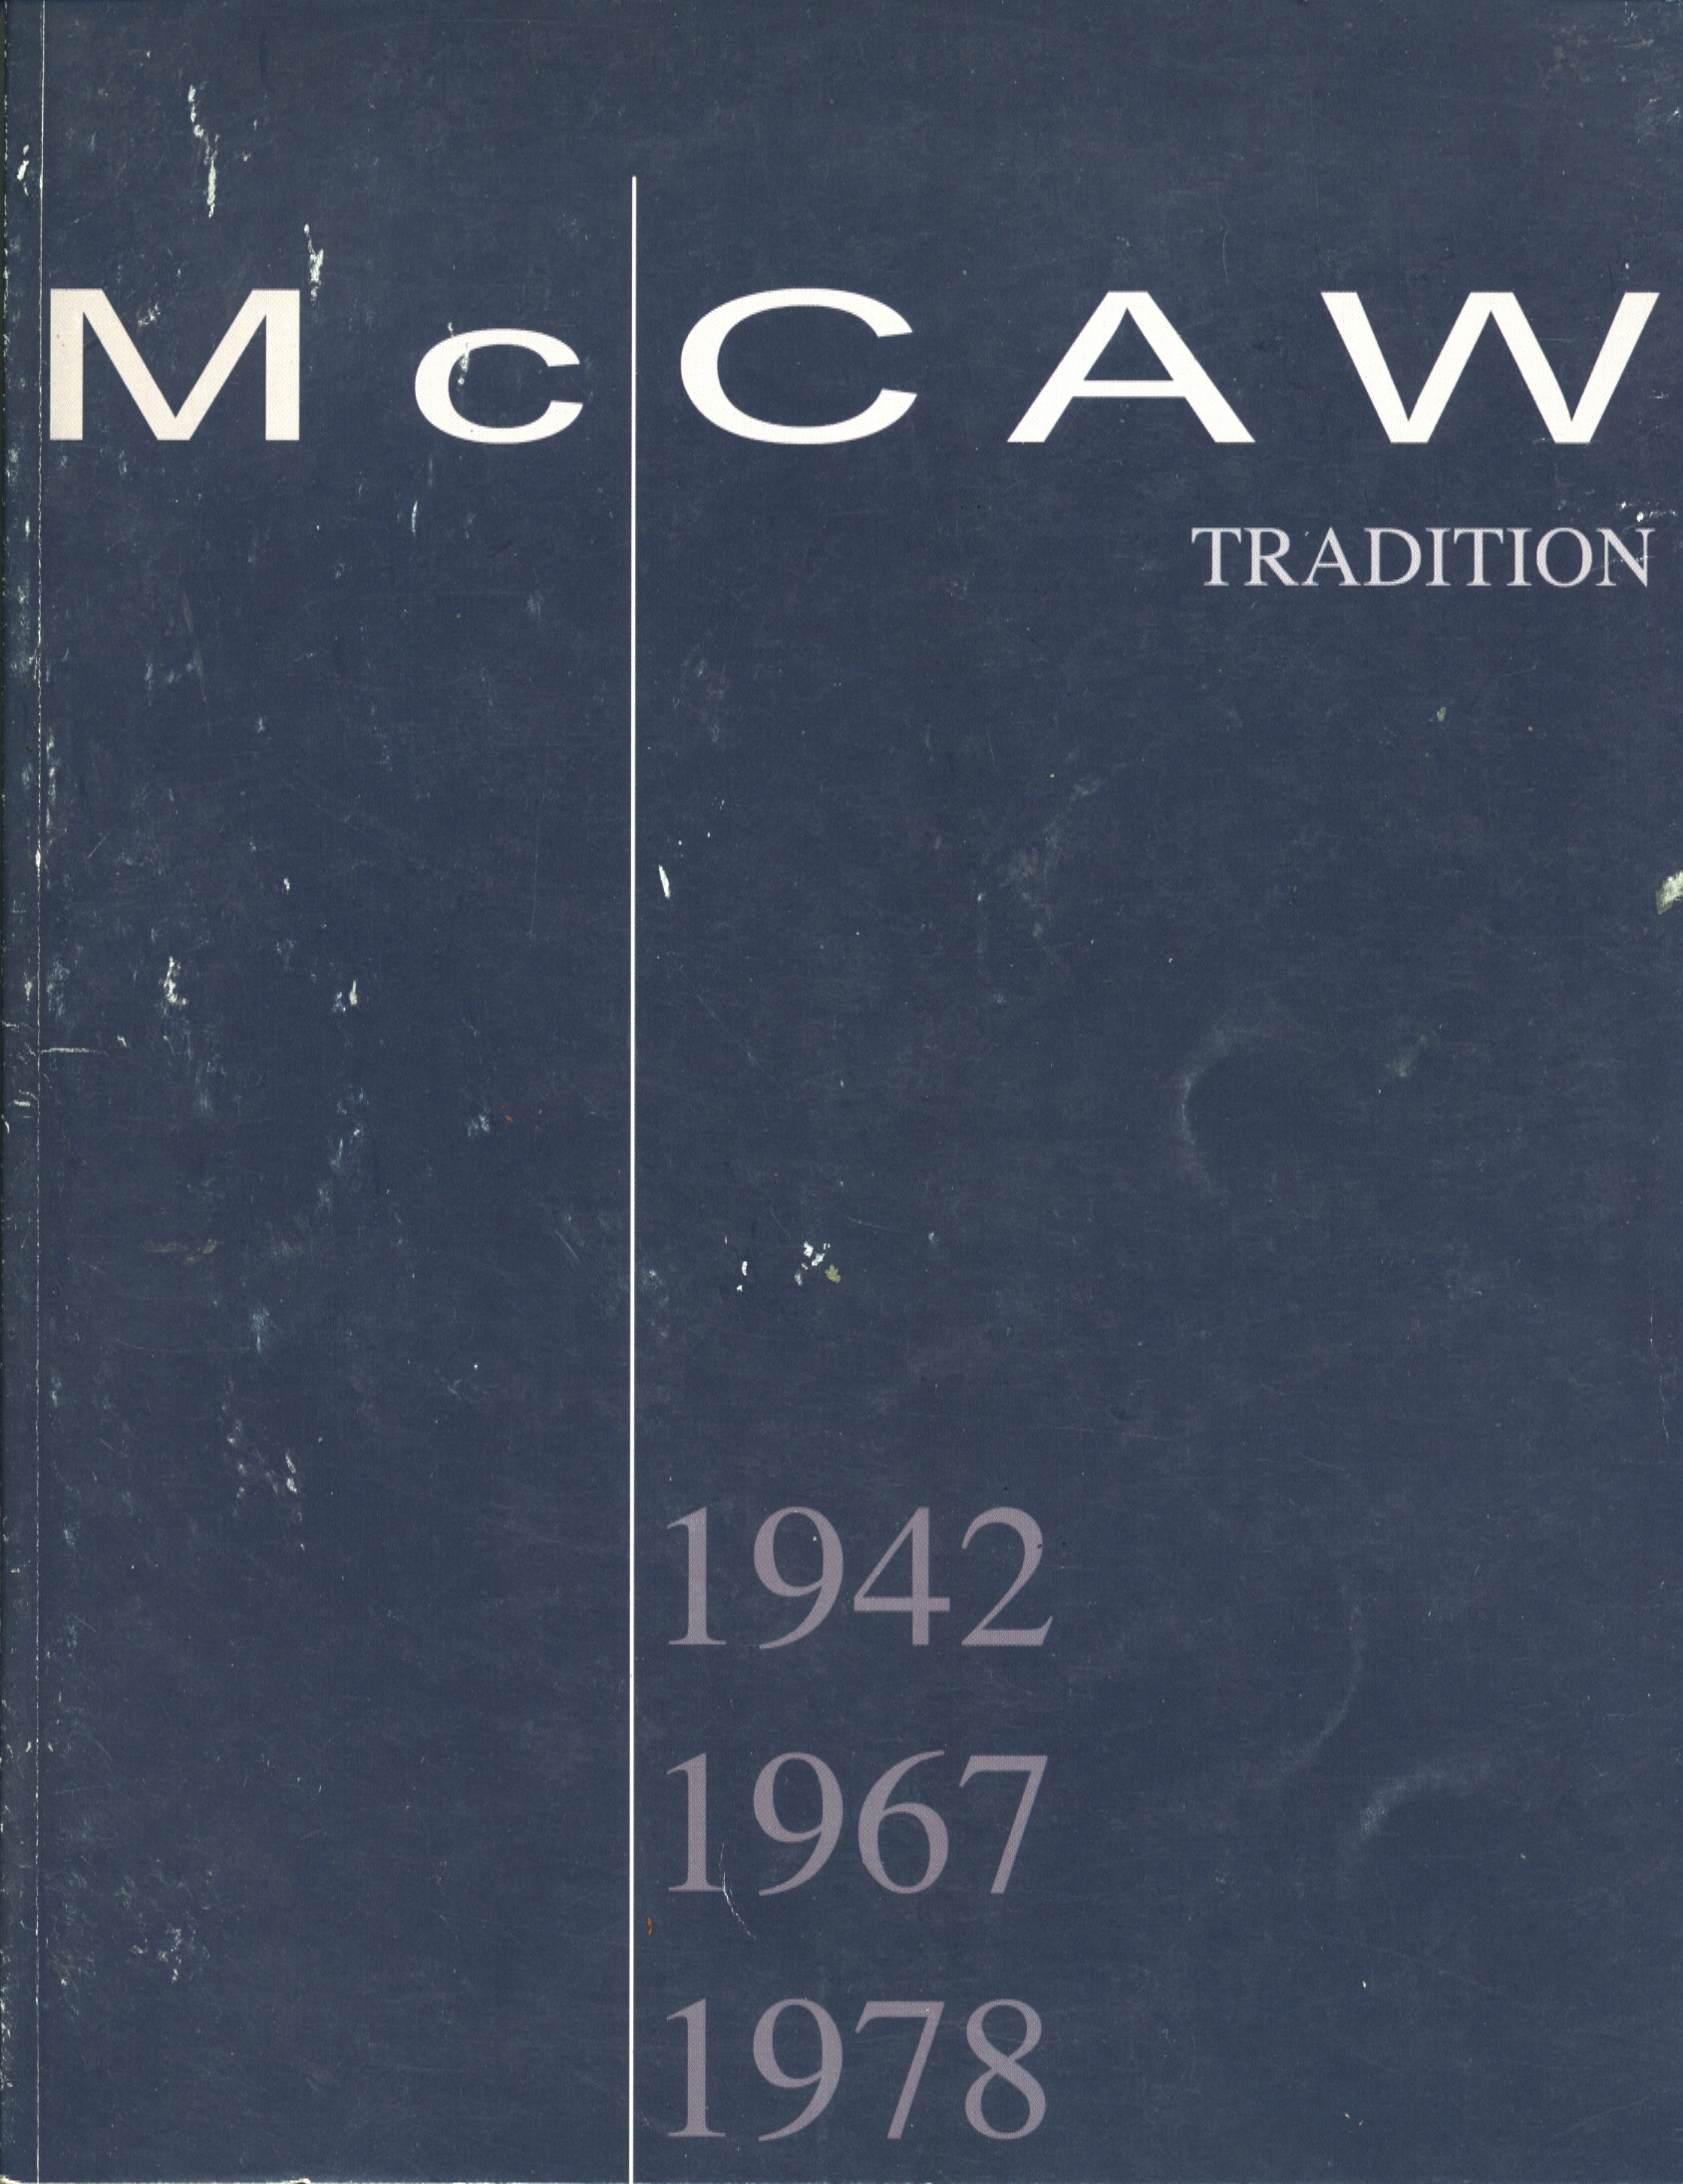 McCaw6a copy 2.jpg